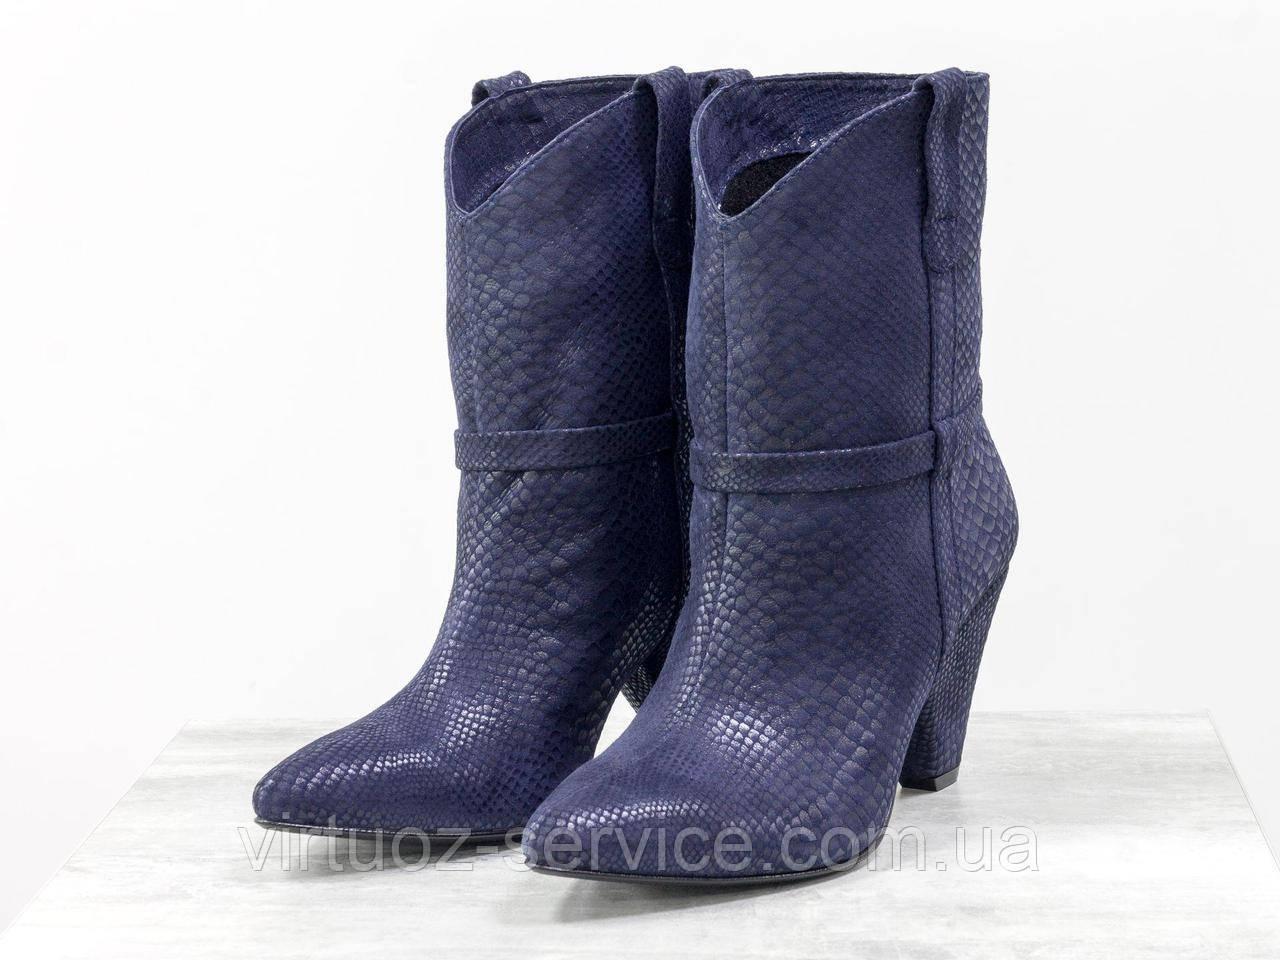 Ботинки женские Gino Figini Б-1902-13 из натуральной кожи 38 Синий